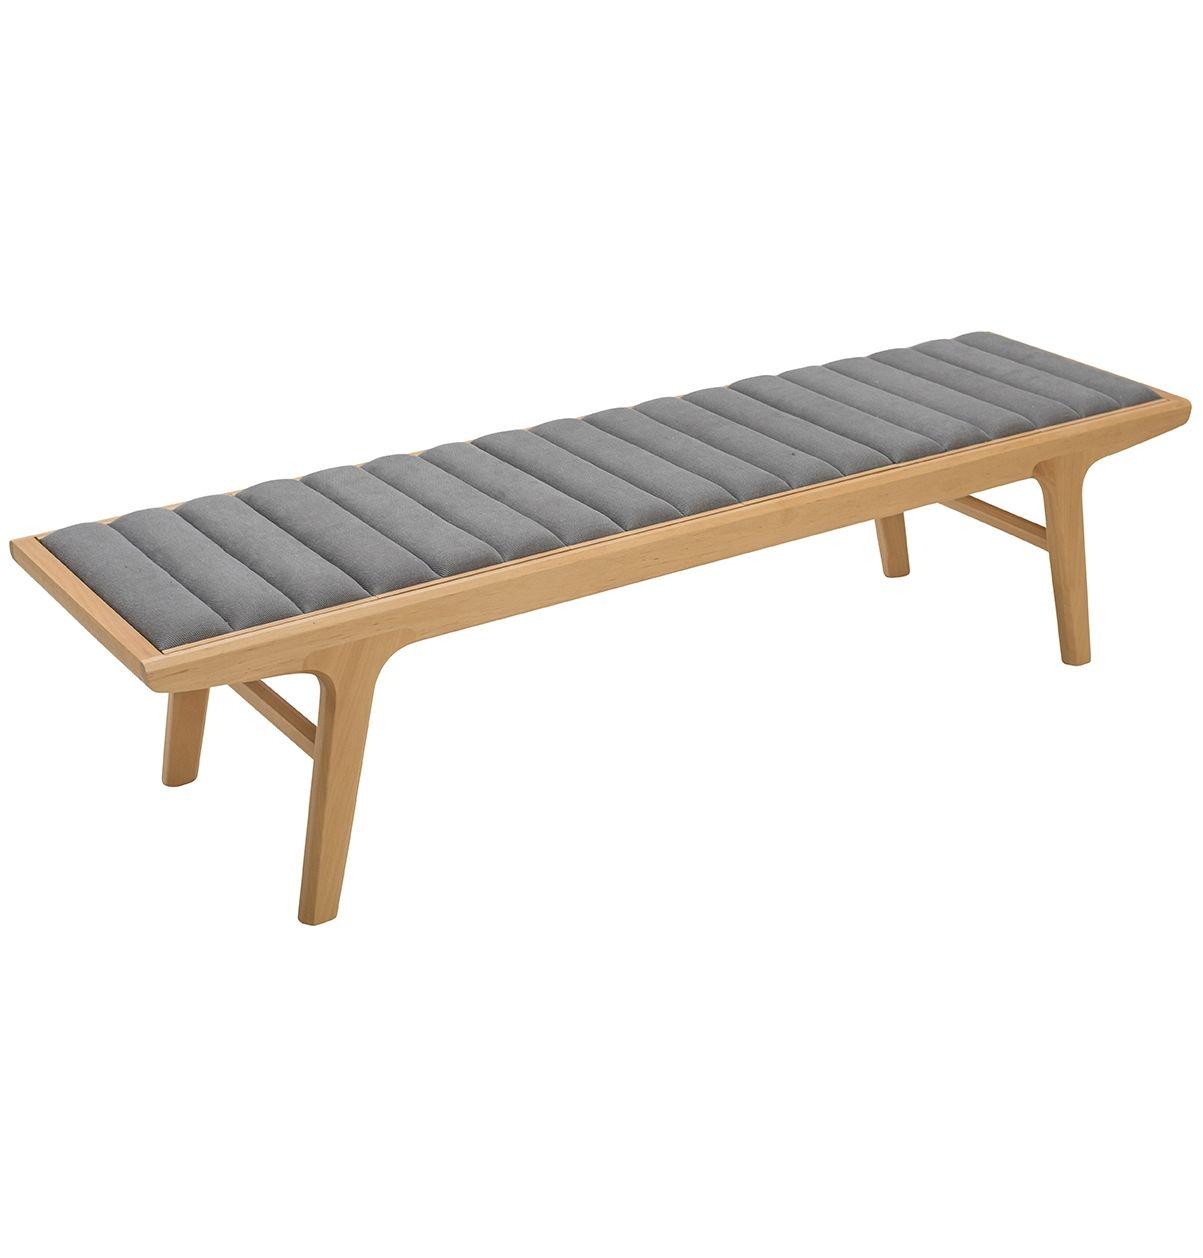 Original Design Sean Dix Reverso Coffee Table Bench Matt